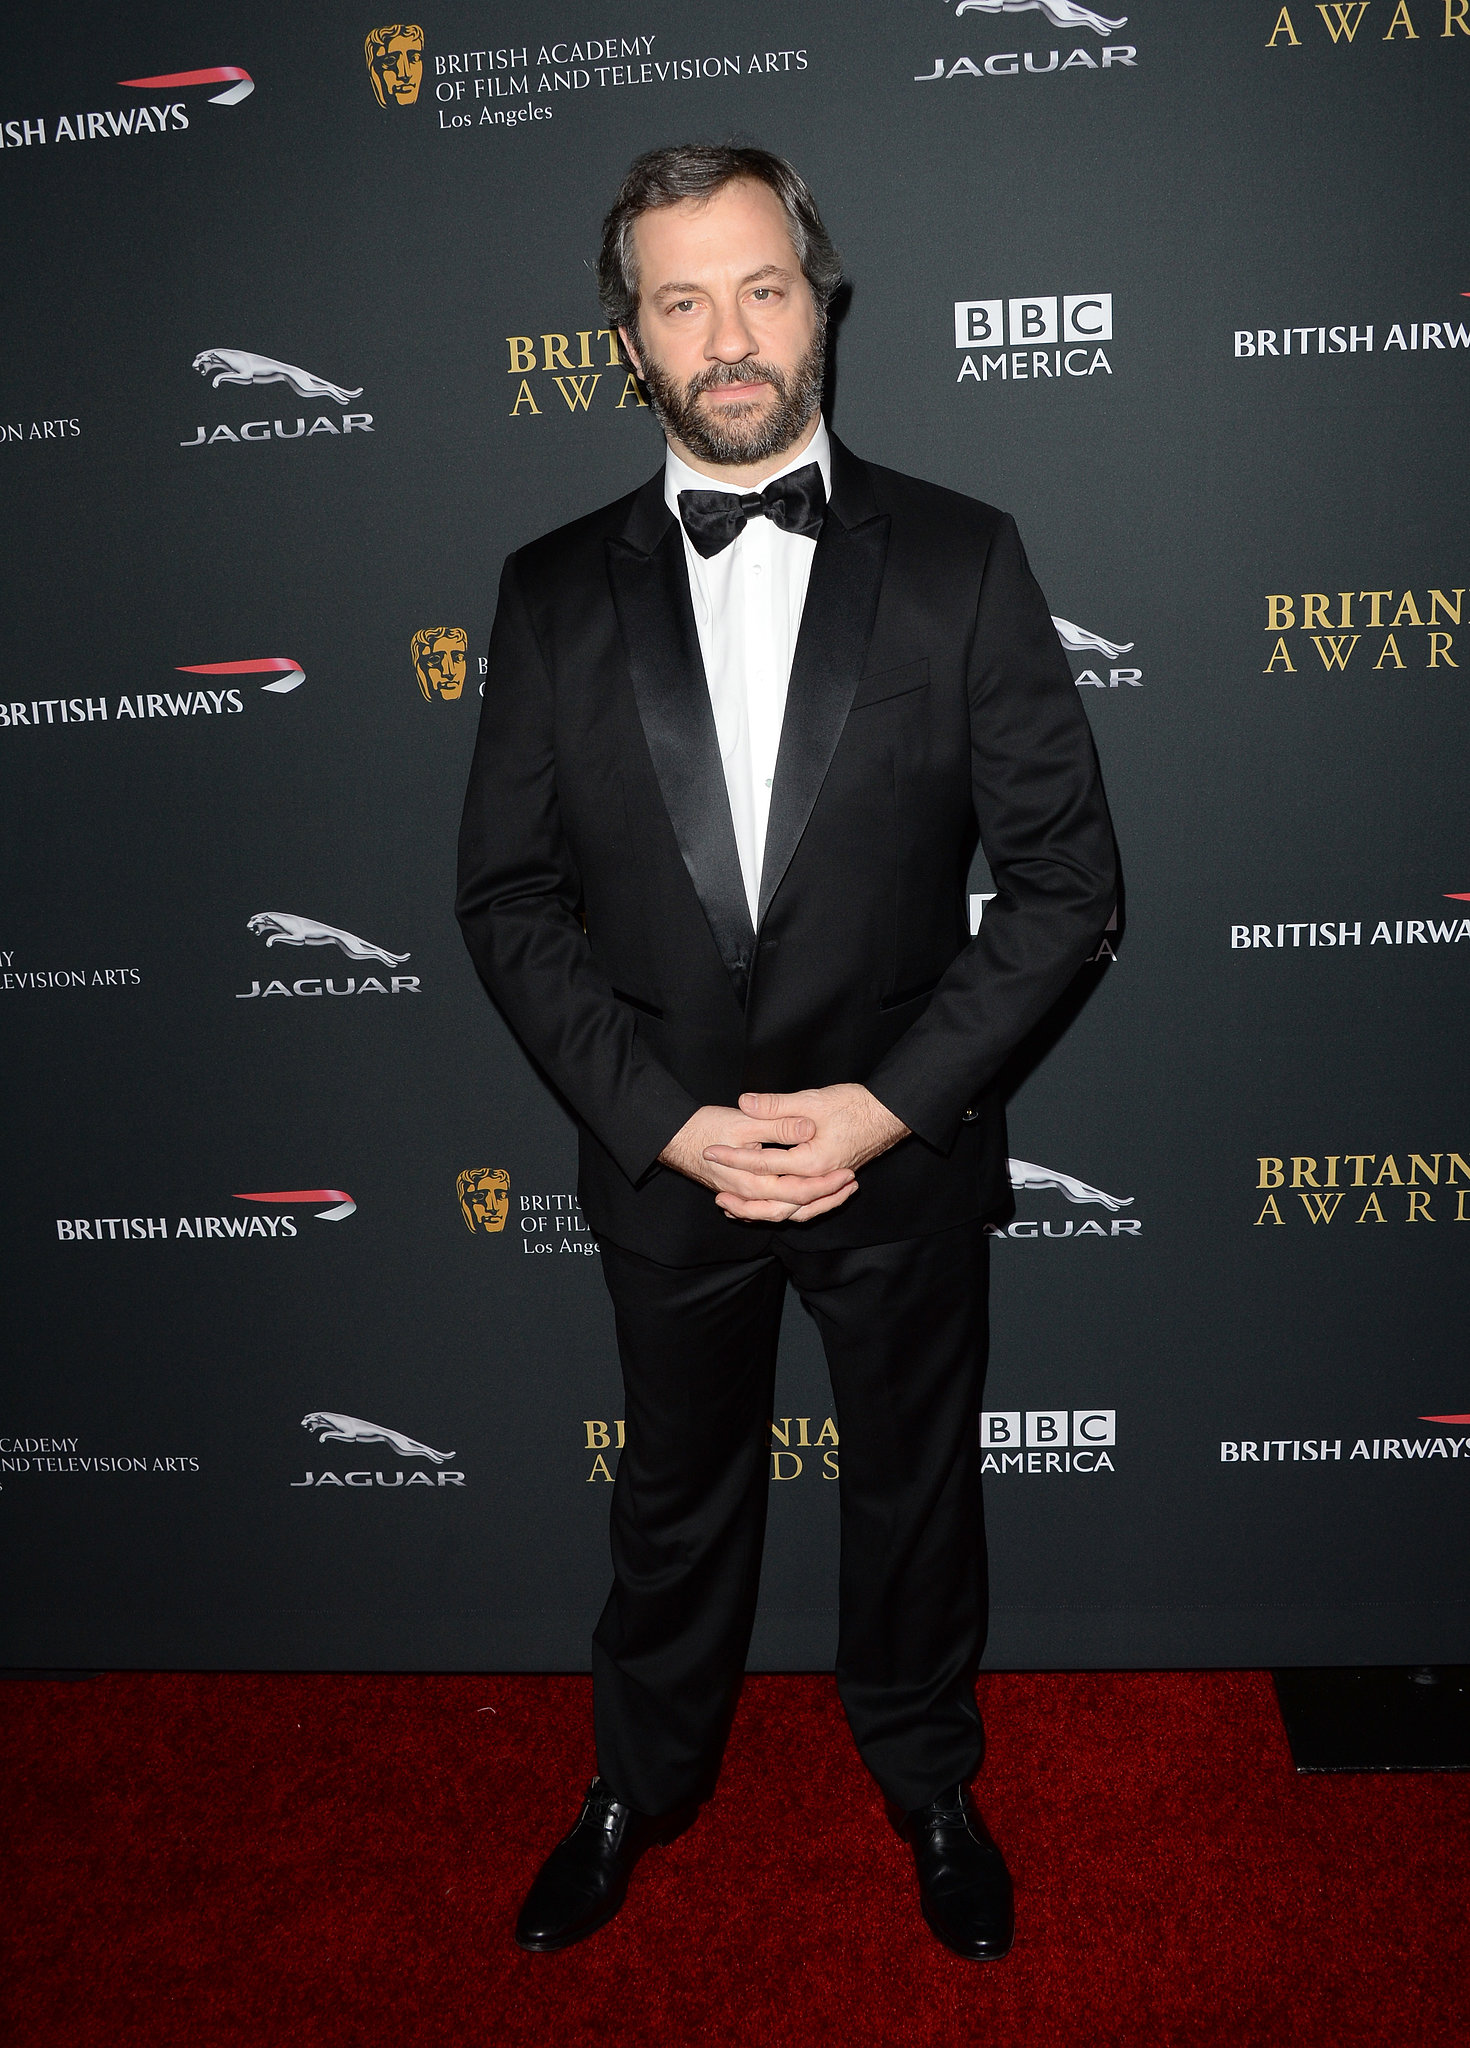 Judd Apatow attended the BAFTA LA Jaguar Britannia Awards.